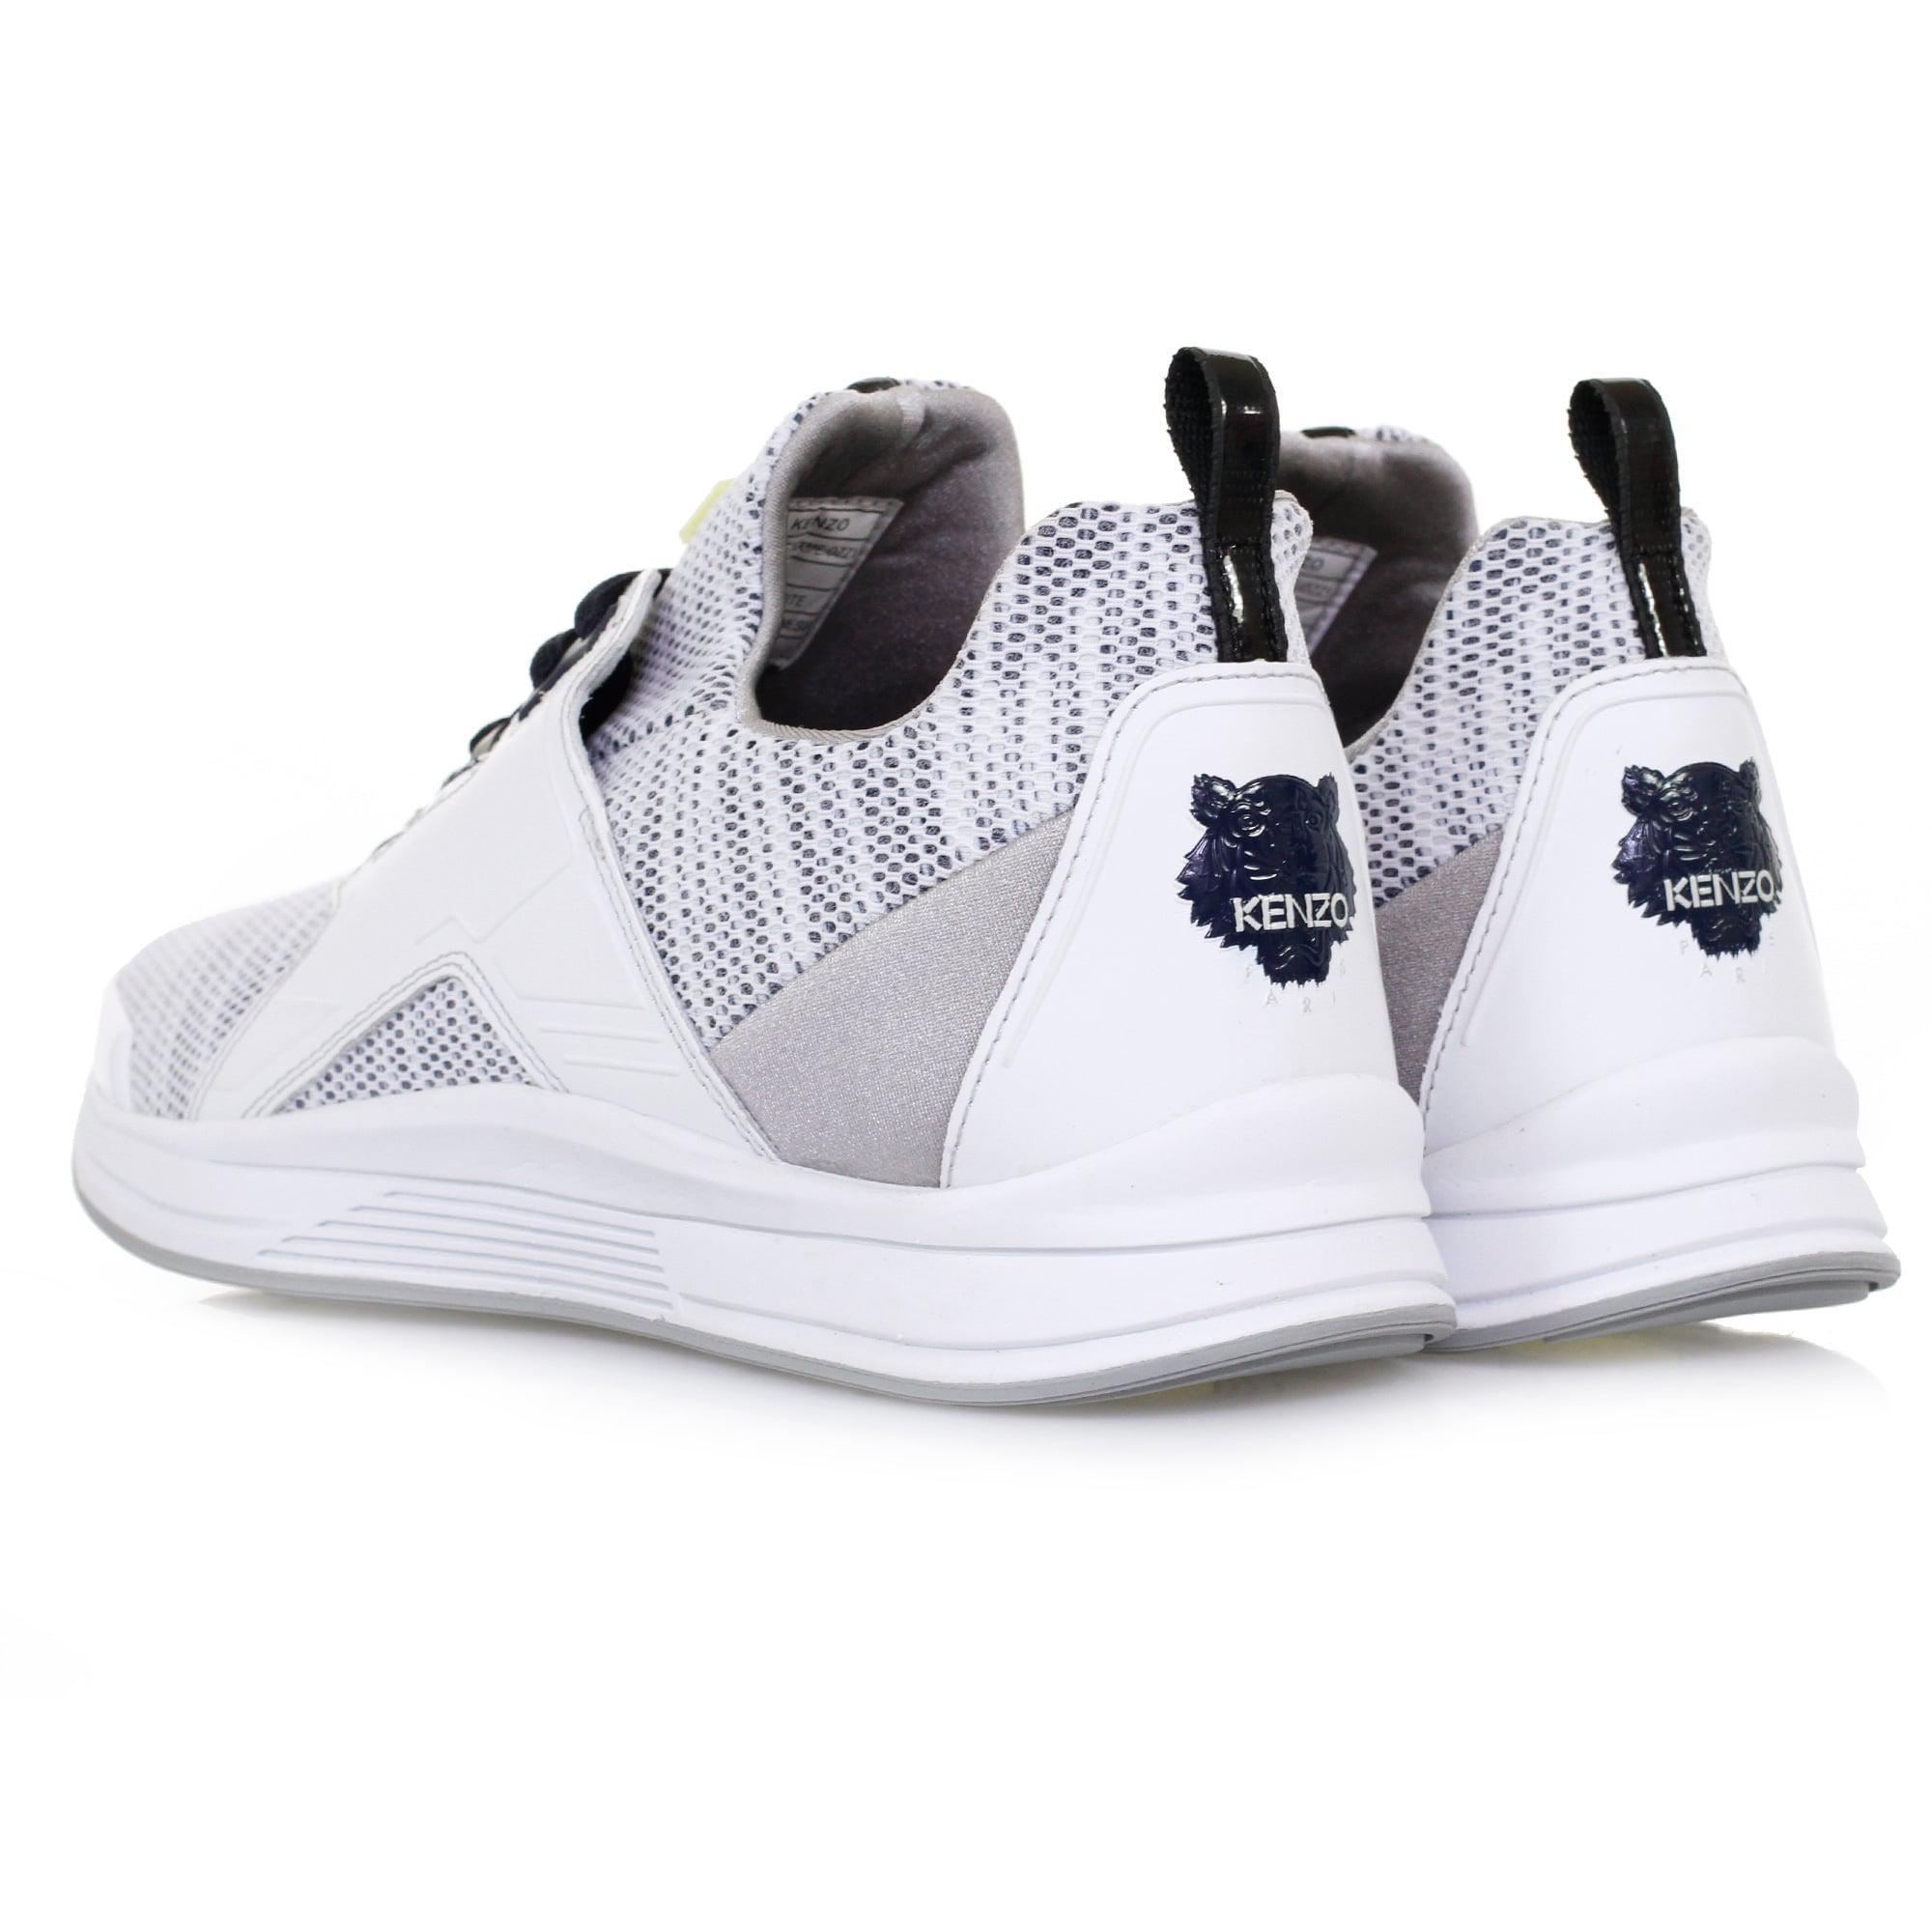 a34bb3636de9 Lyst - KENZO Ozzy E17 Mesh White Shoe in White for Men